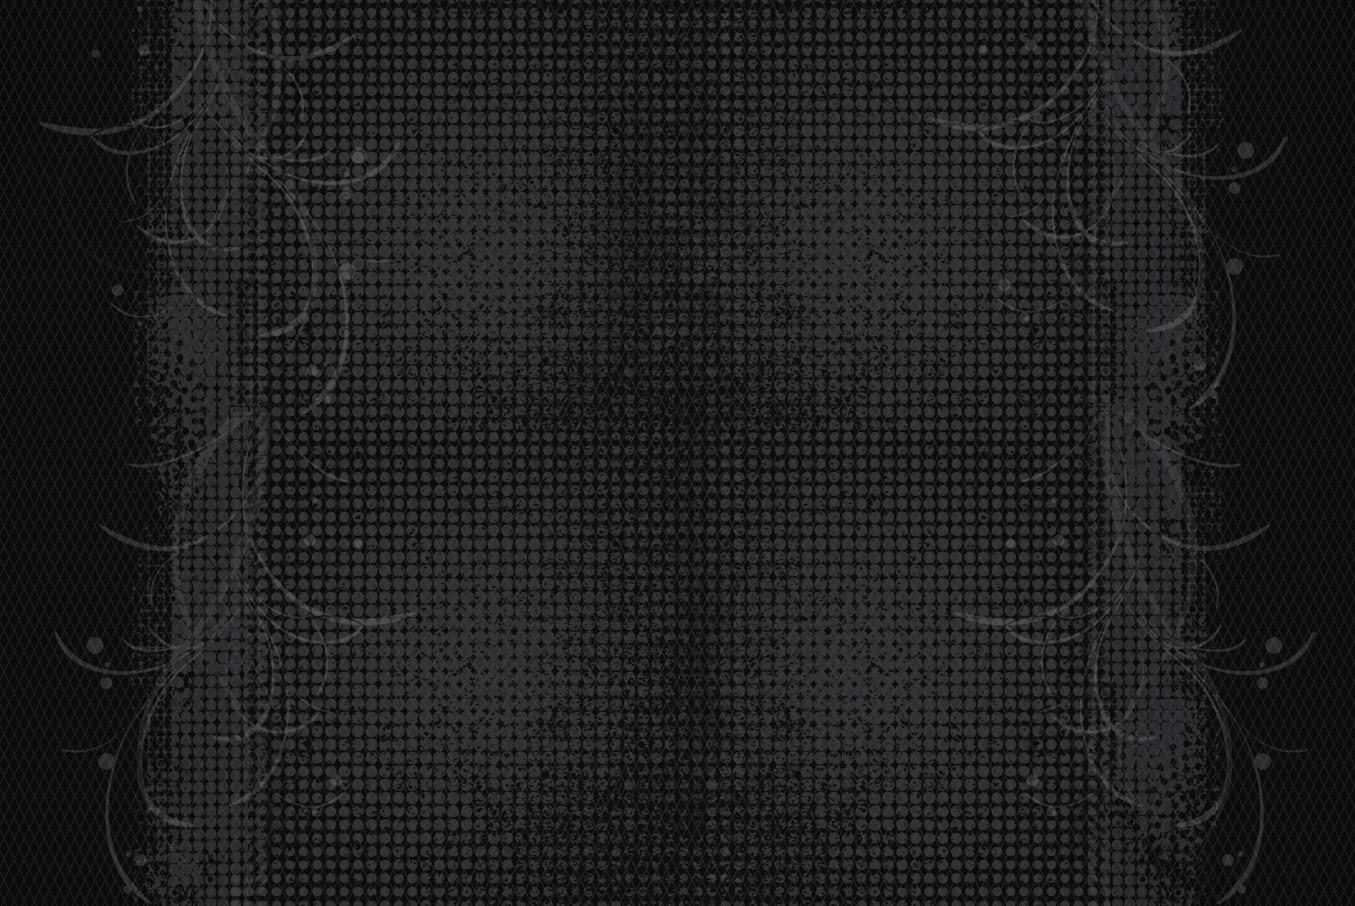 background_v2.jpg